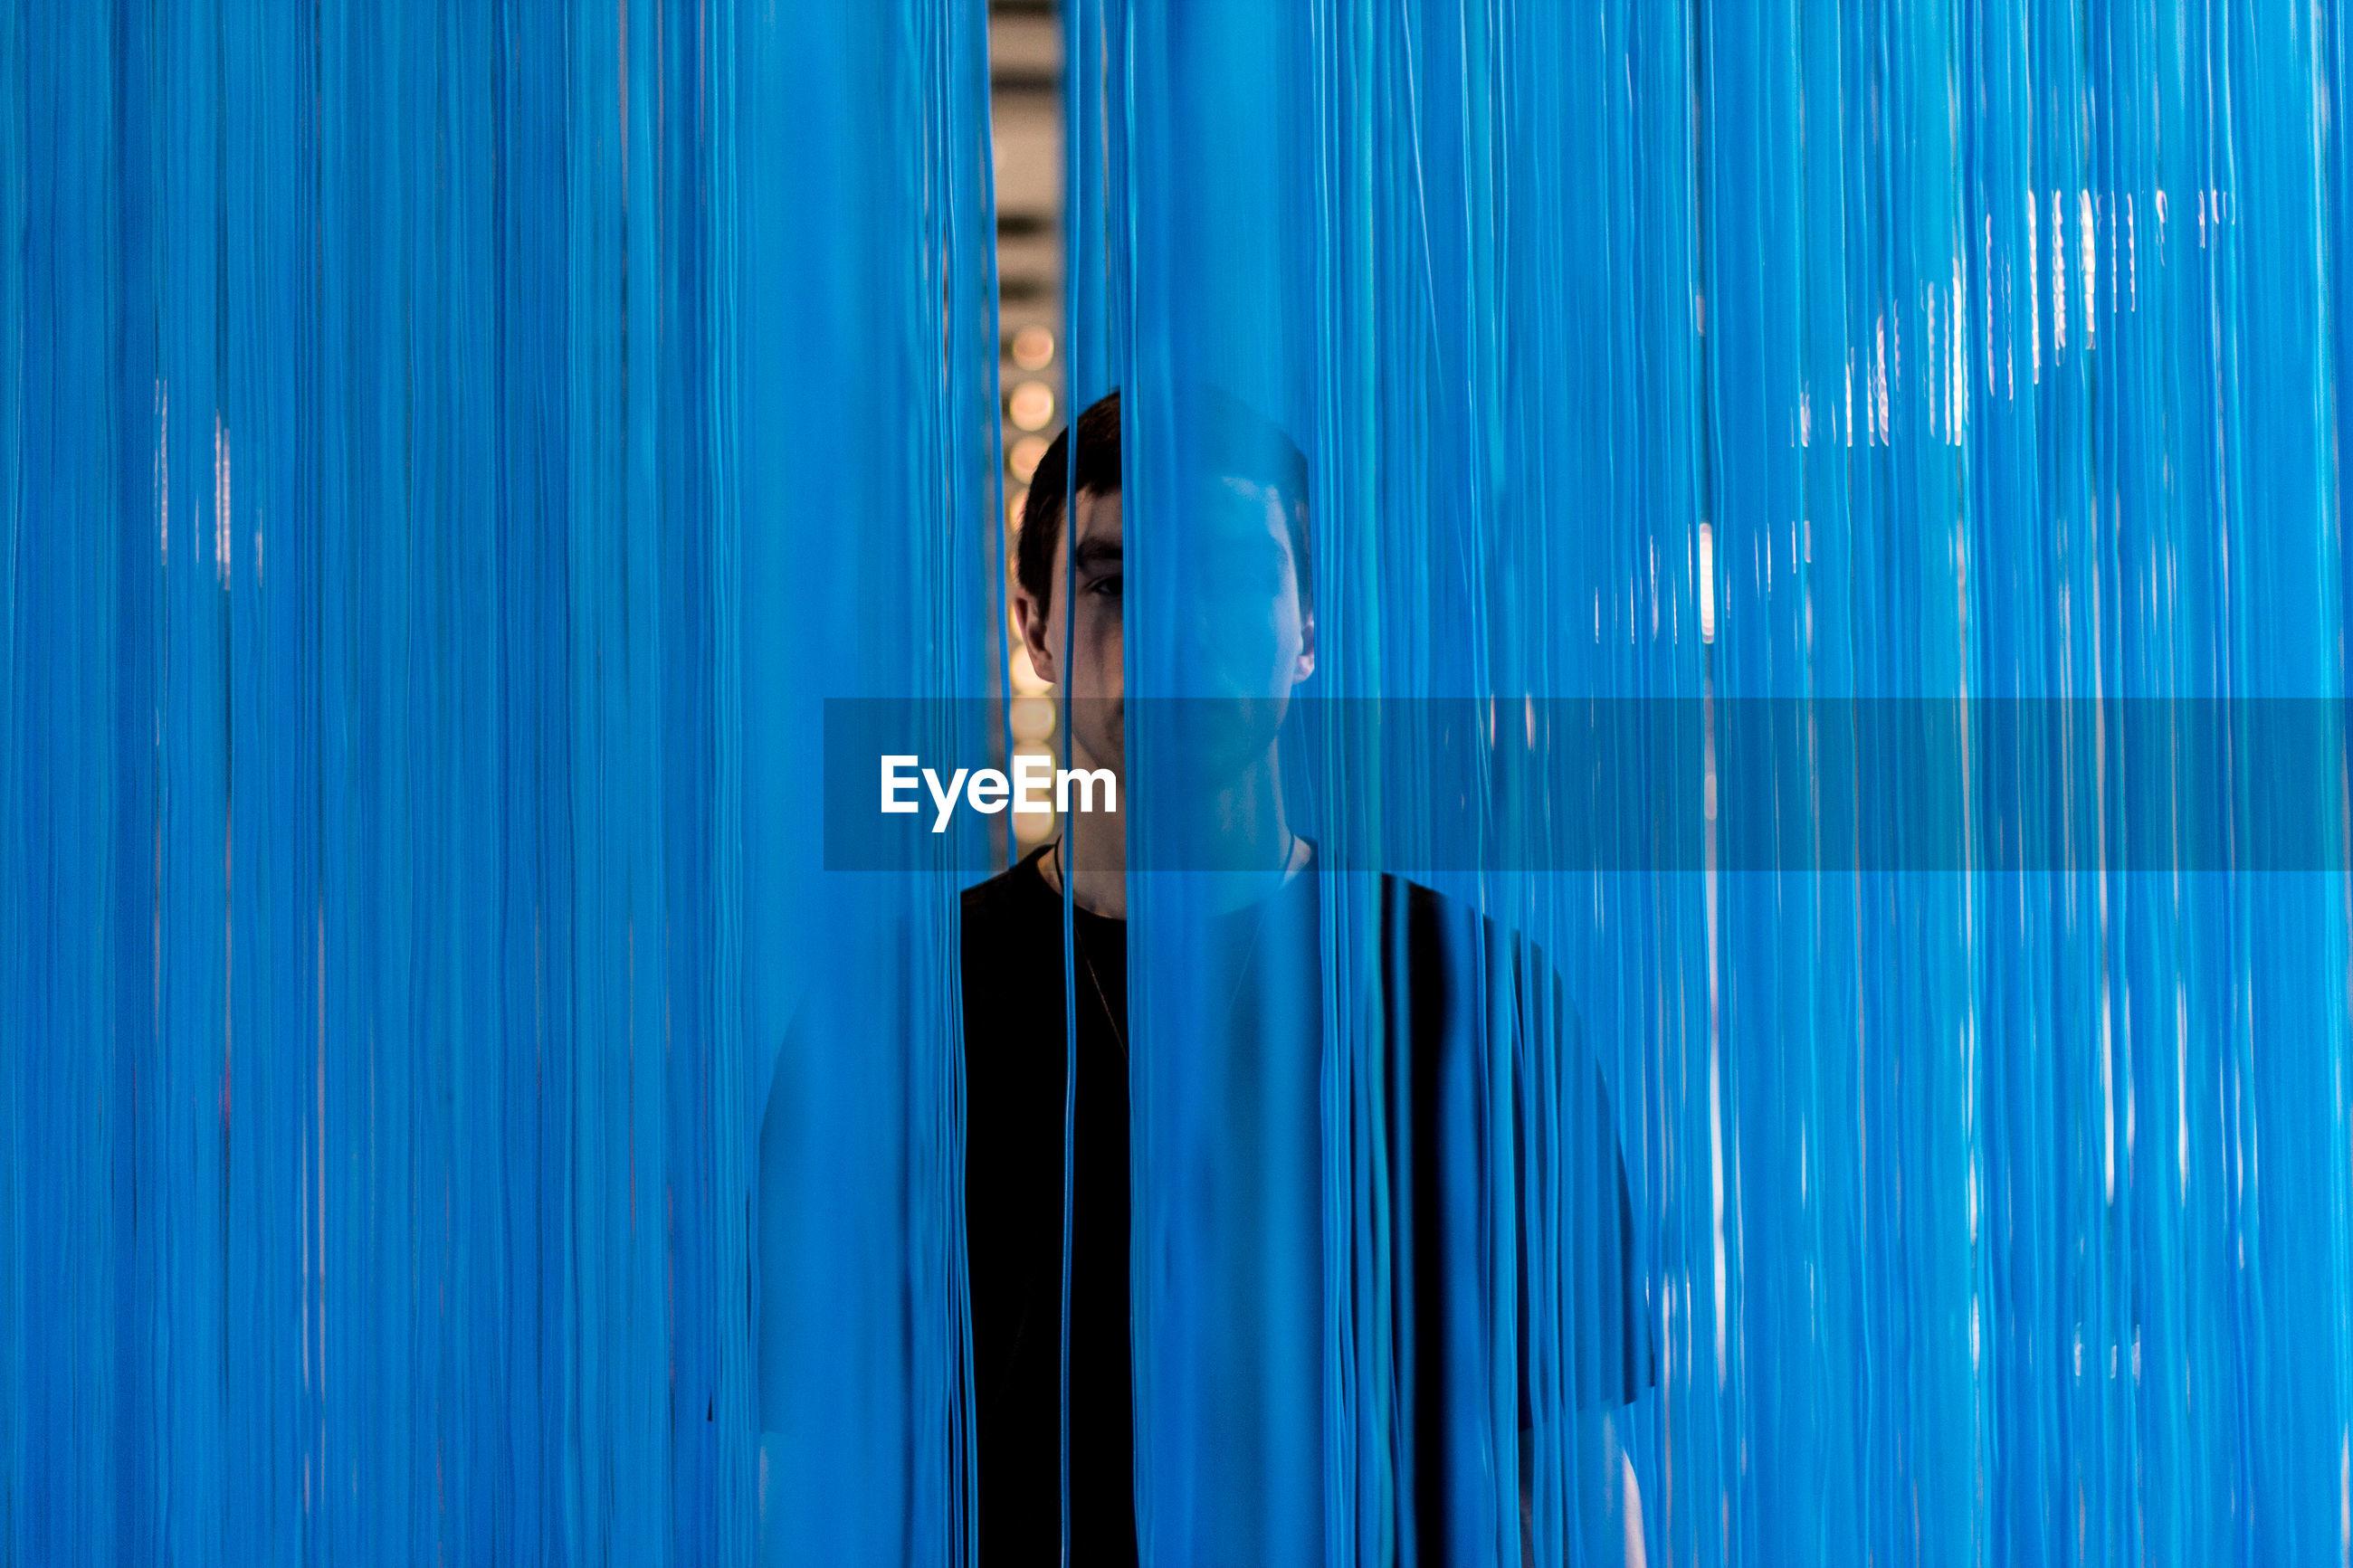 Portrait of man standing behind blue textile